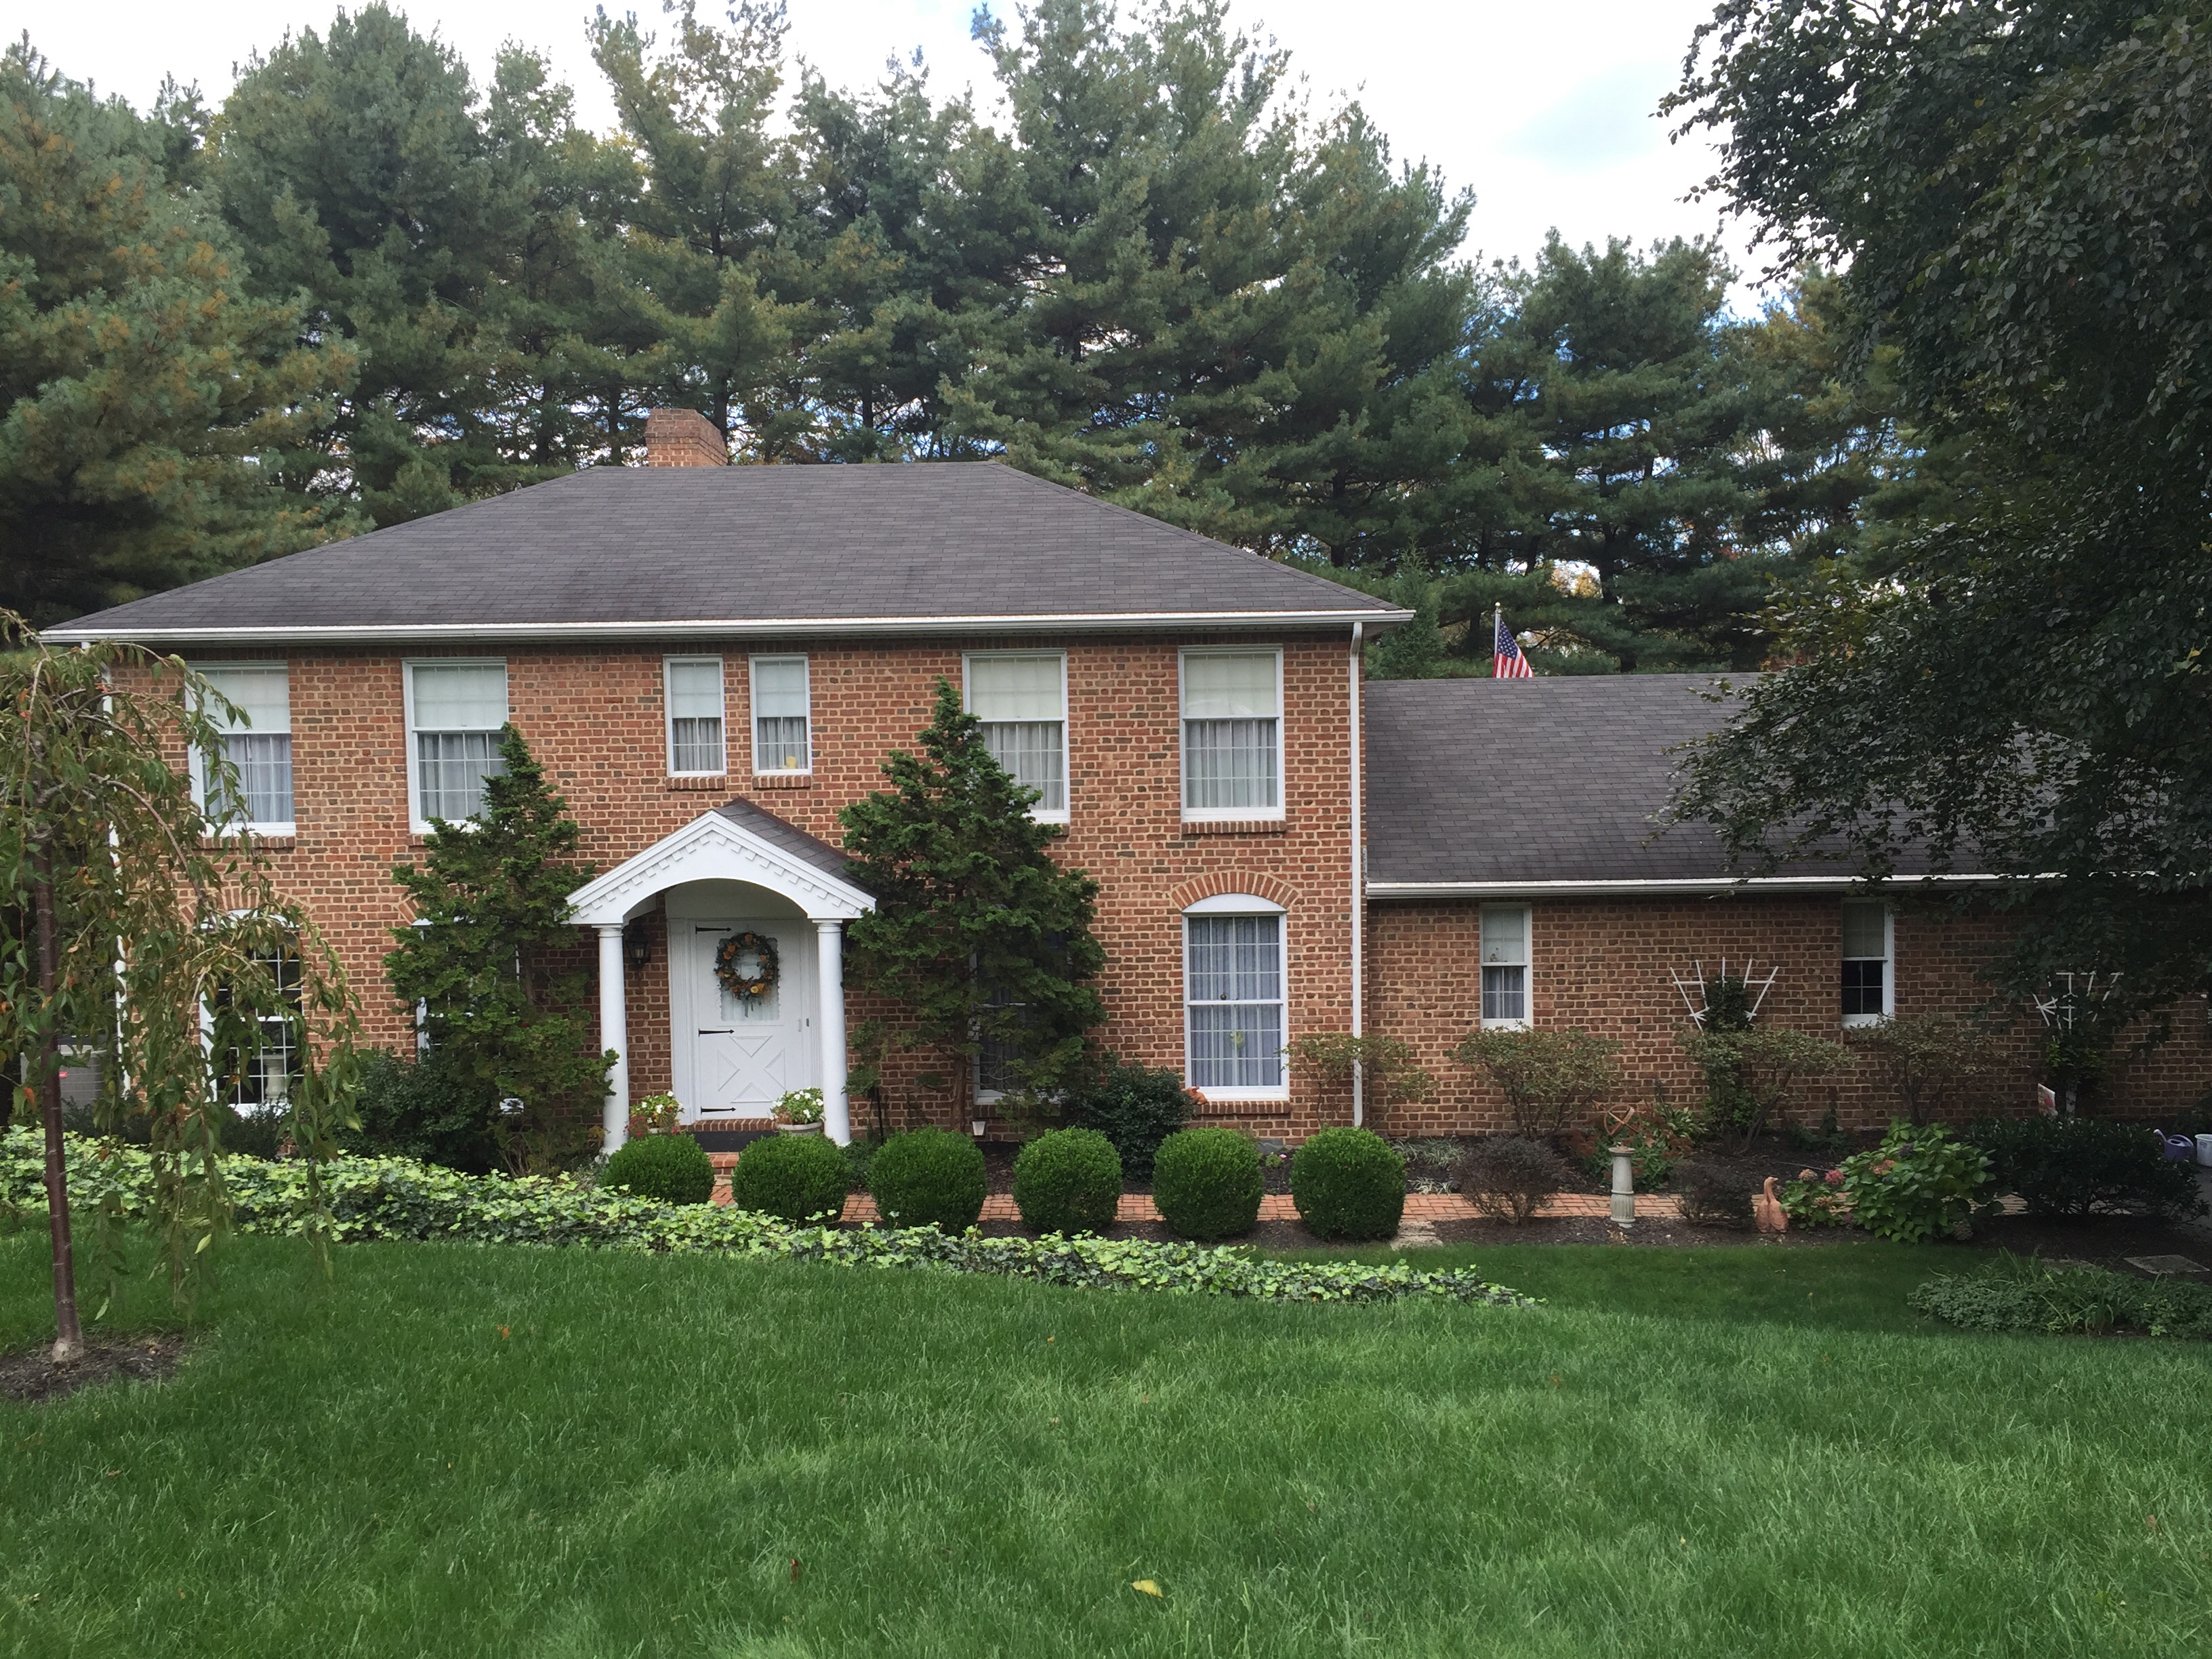 62 S. Terrace Road, Wormleysburg, Pennsylvania 17043